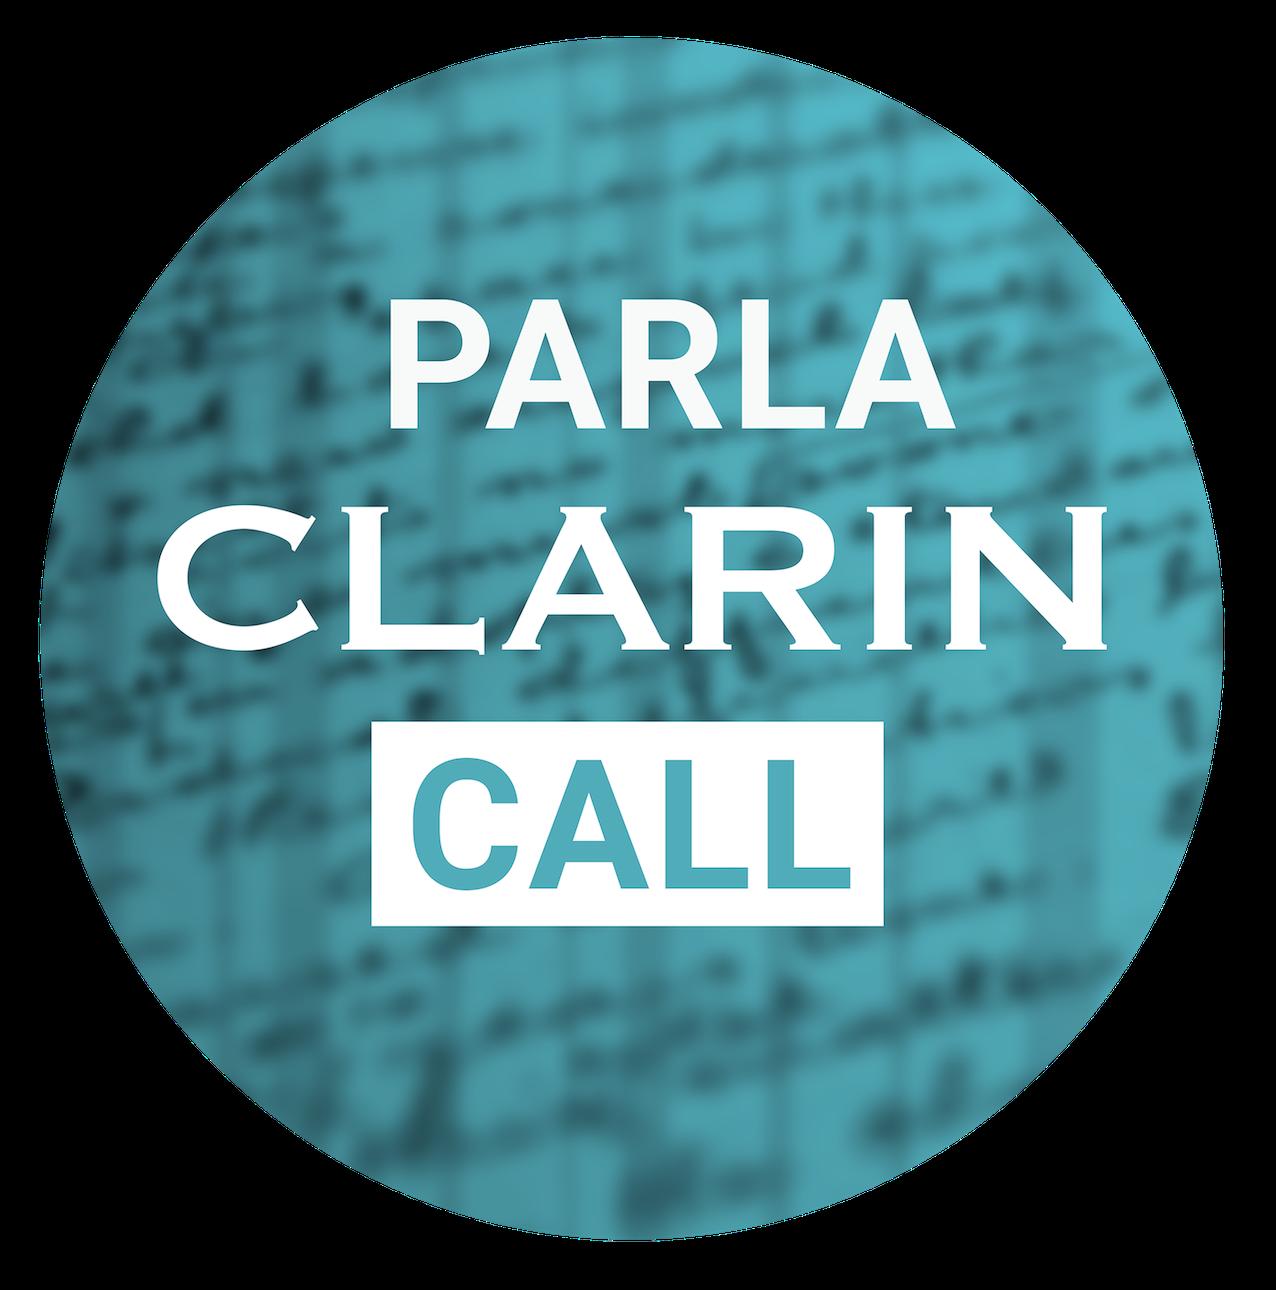 ParlaClarinCircle